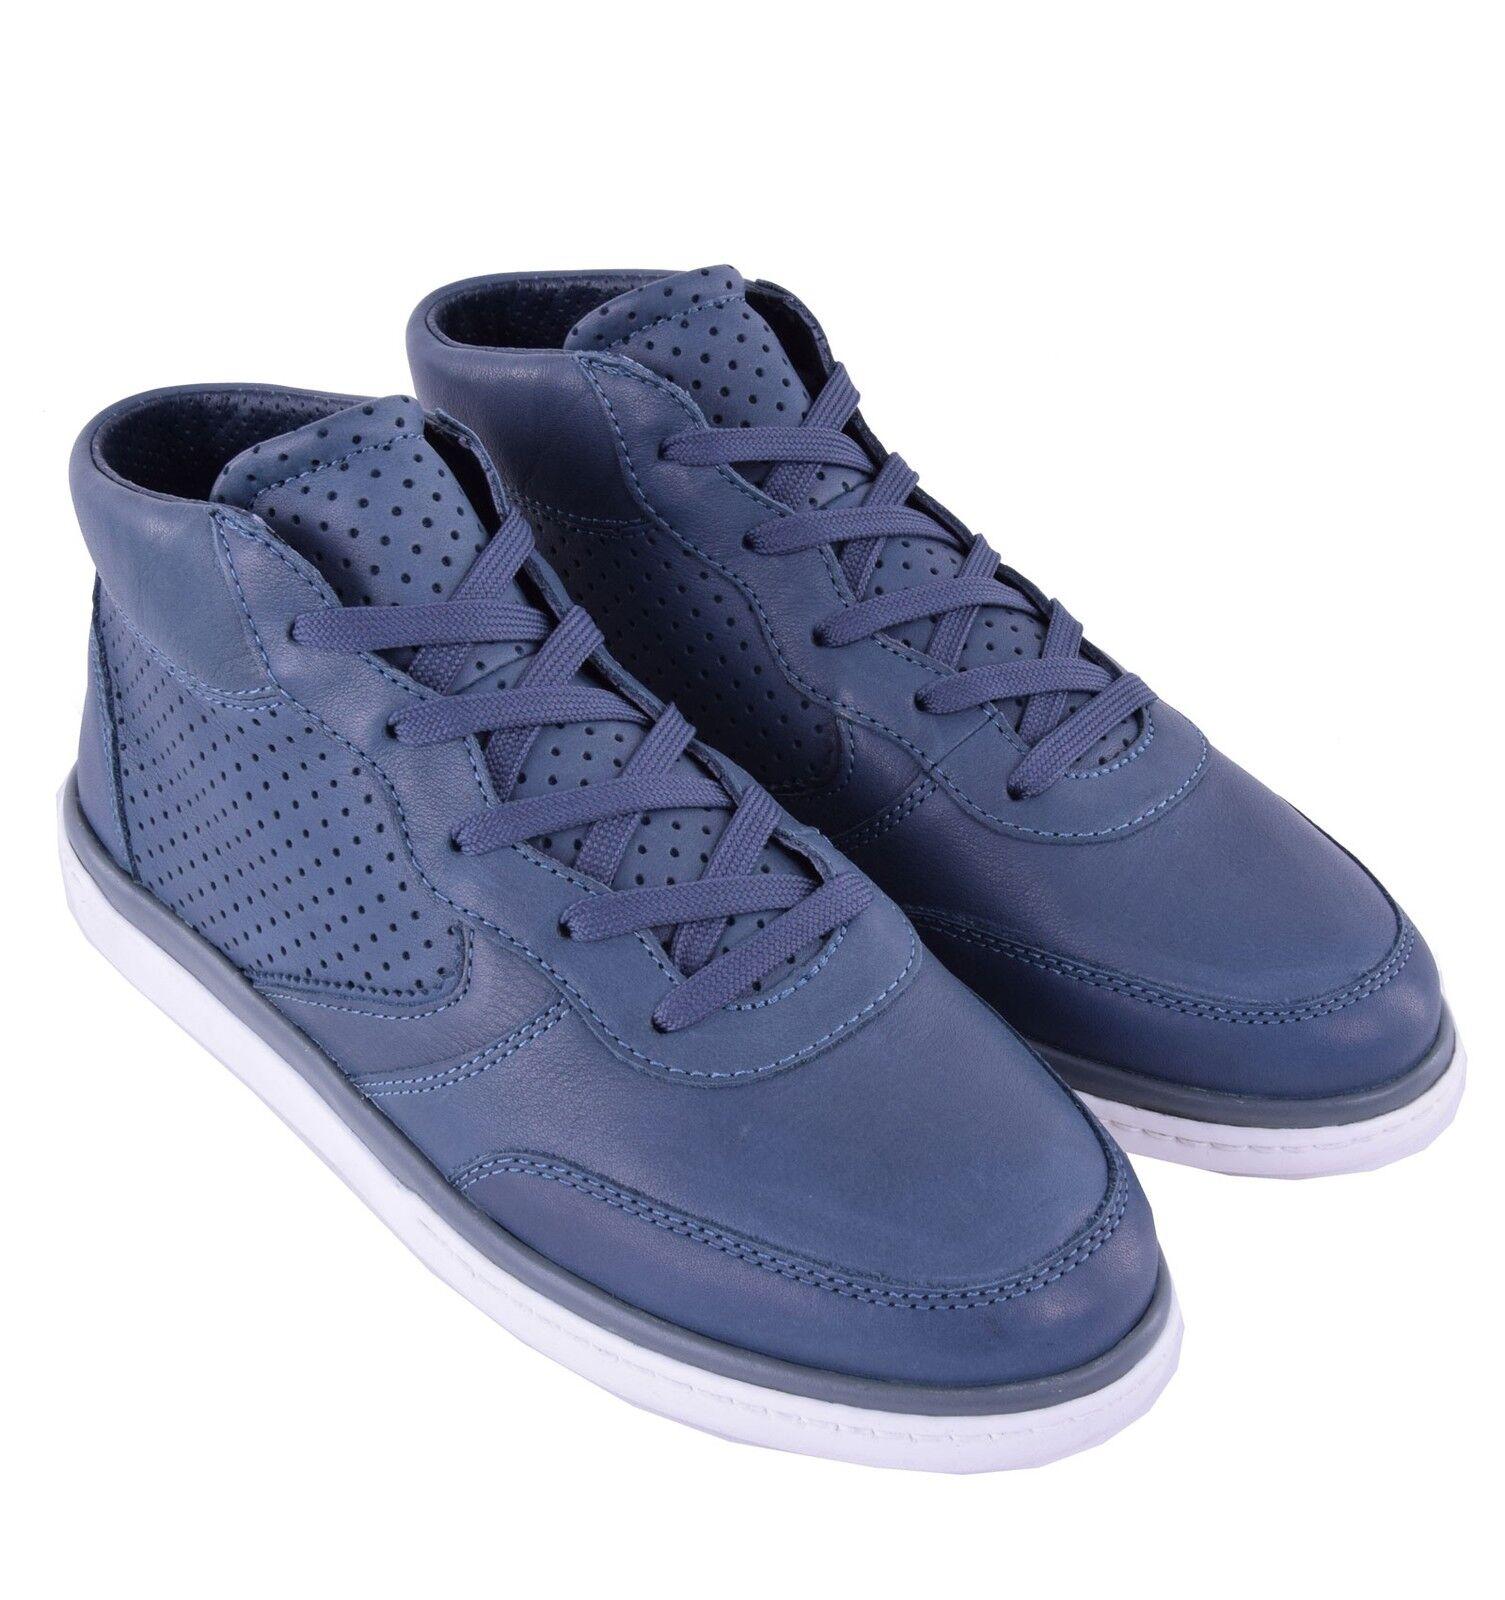 buy online ec354 a3ffe ... Nike Air Jordan XI 11 Low OG Black Dark Grey-True Grey-True ...